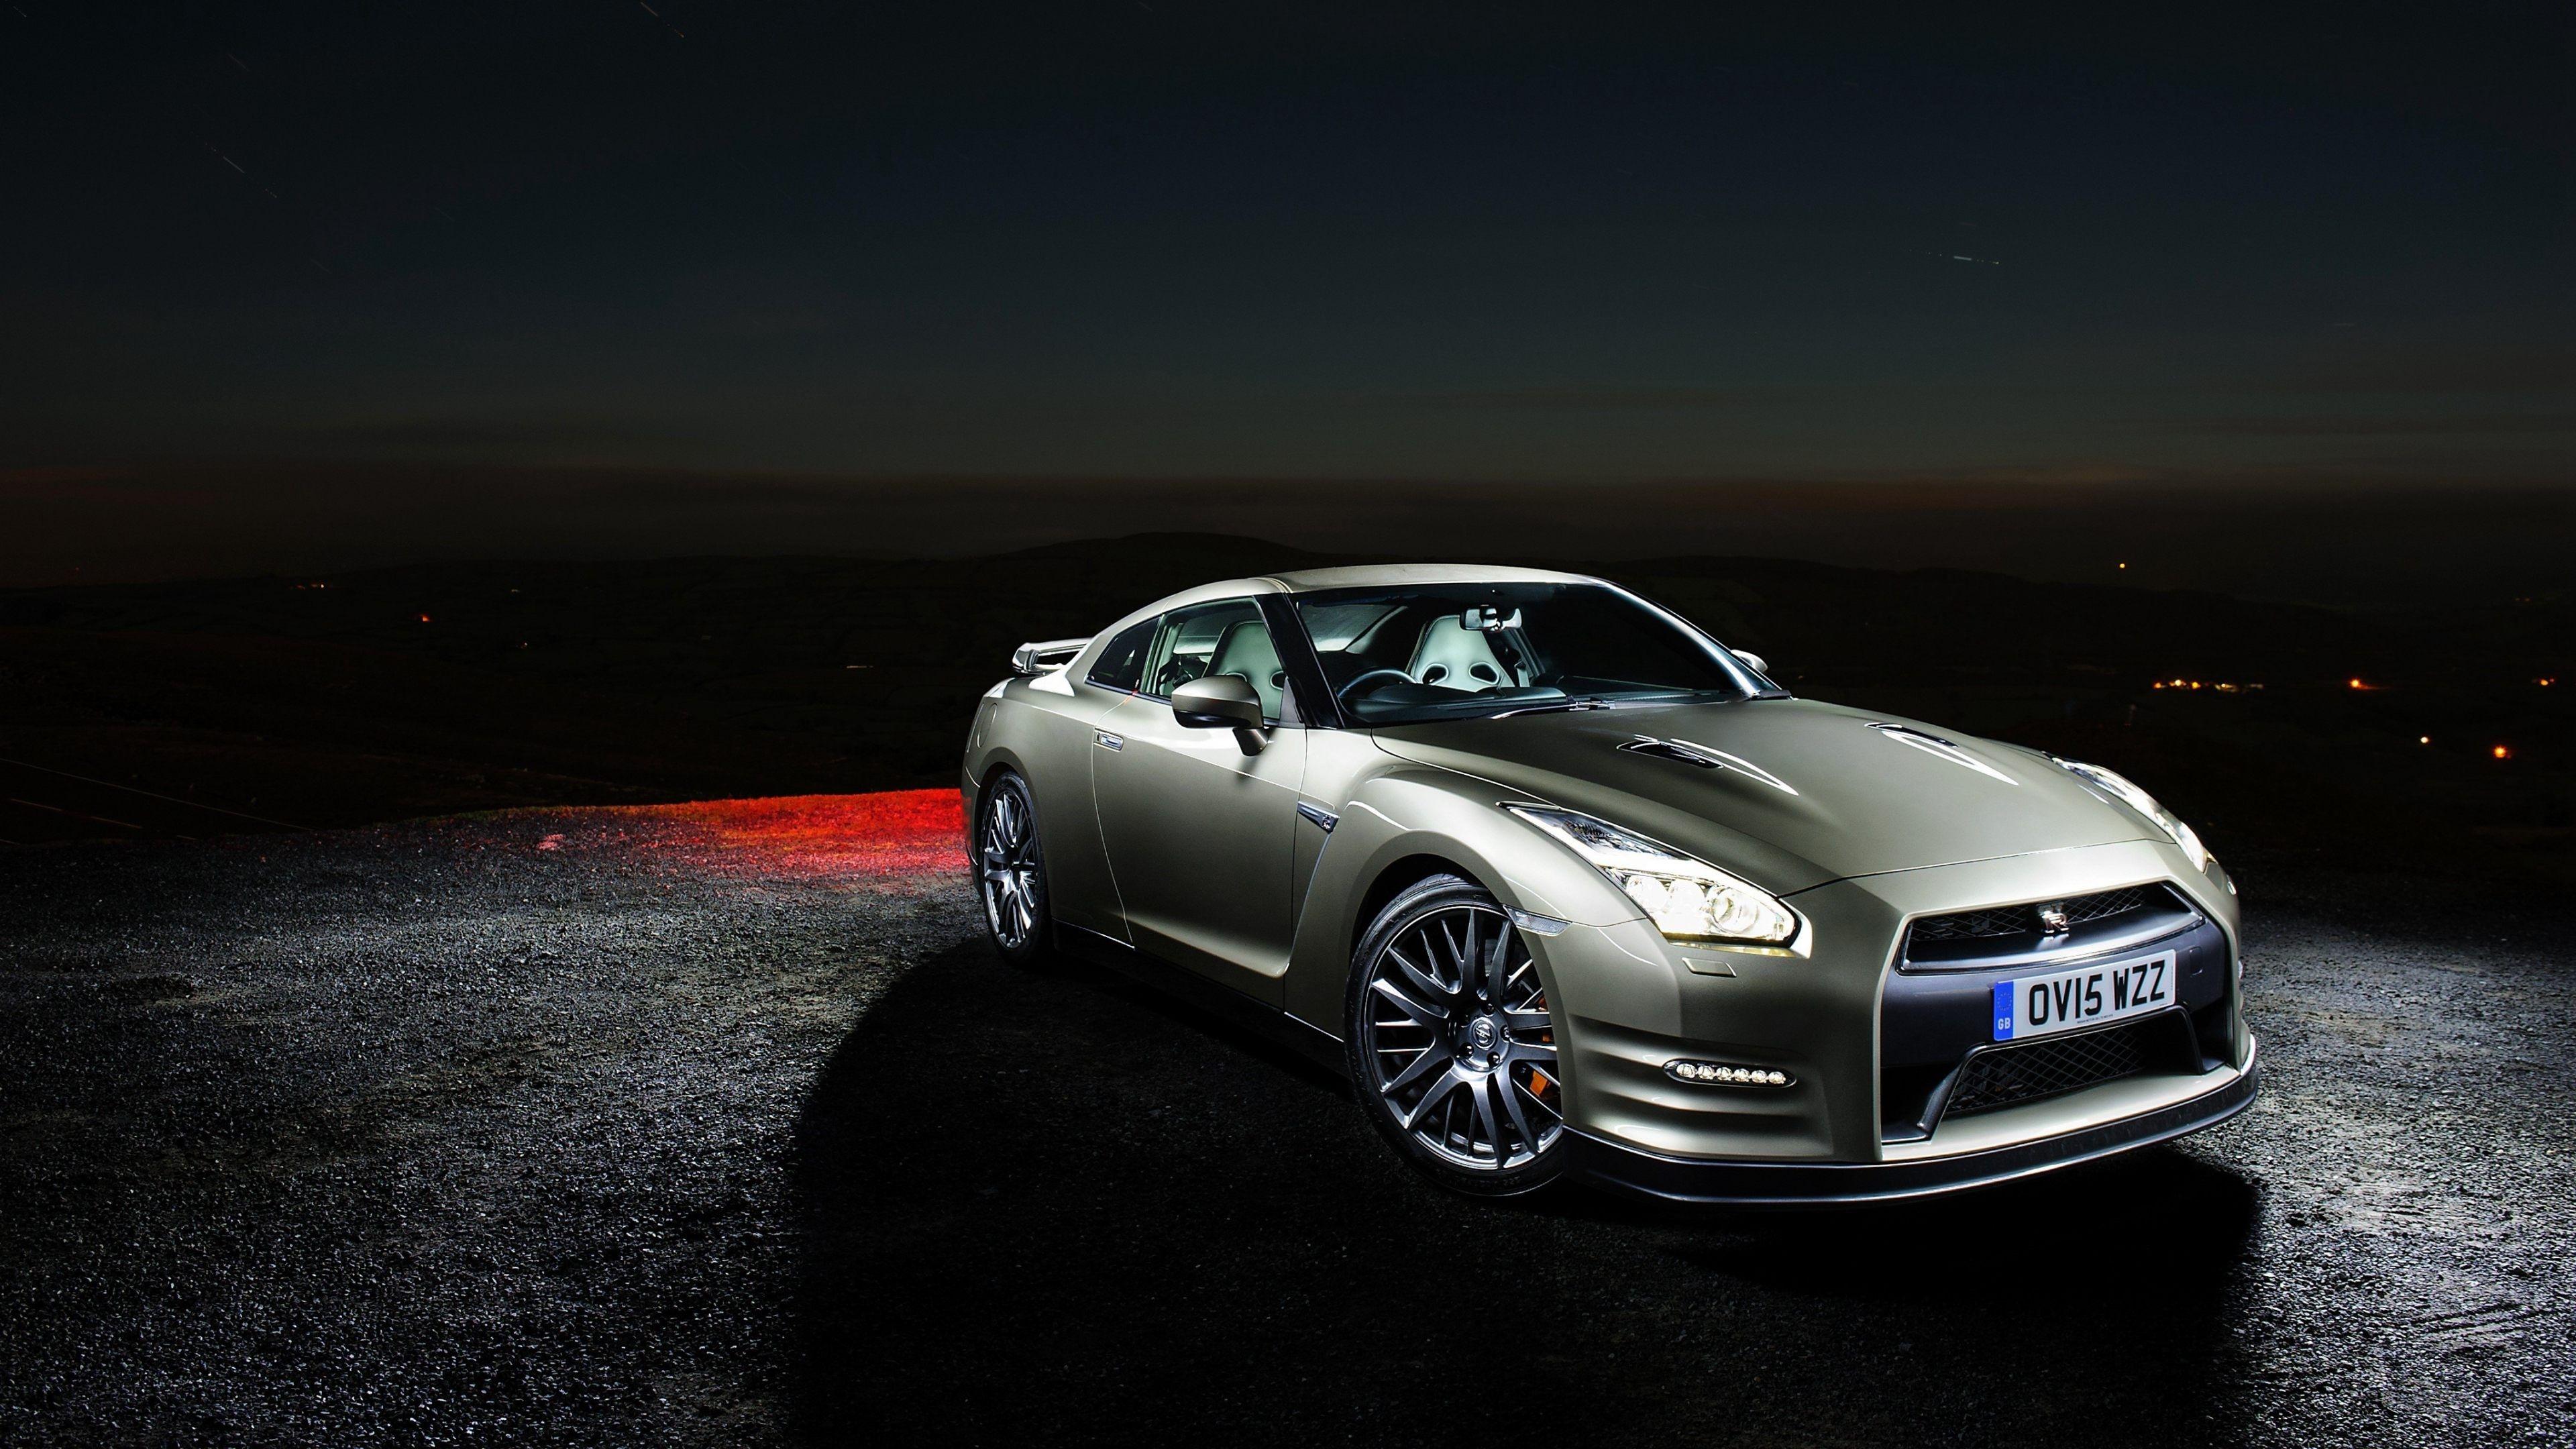 gtr nissan car ultra hd 4k ultra hd wallpaper Nissan gt